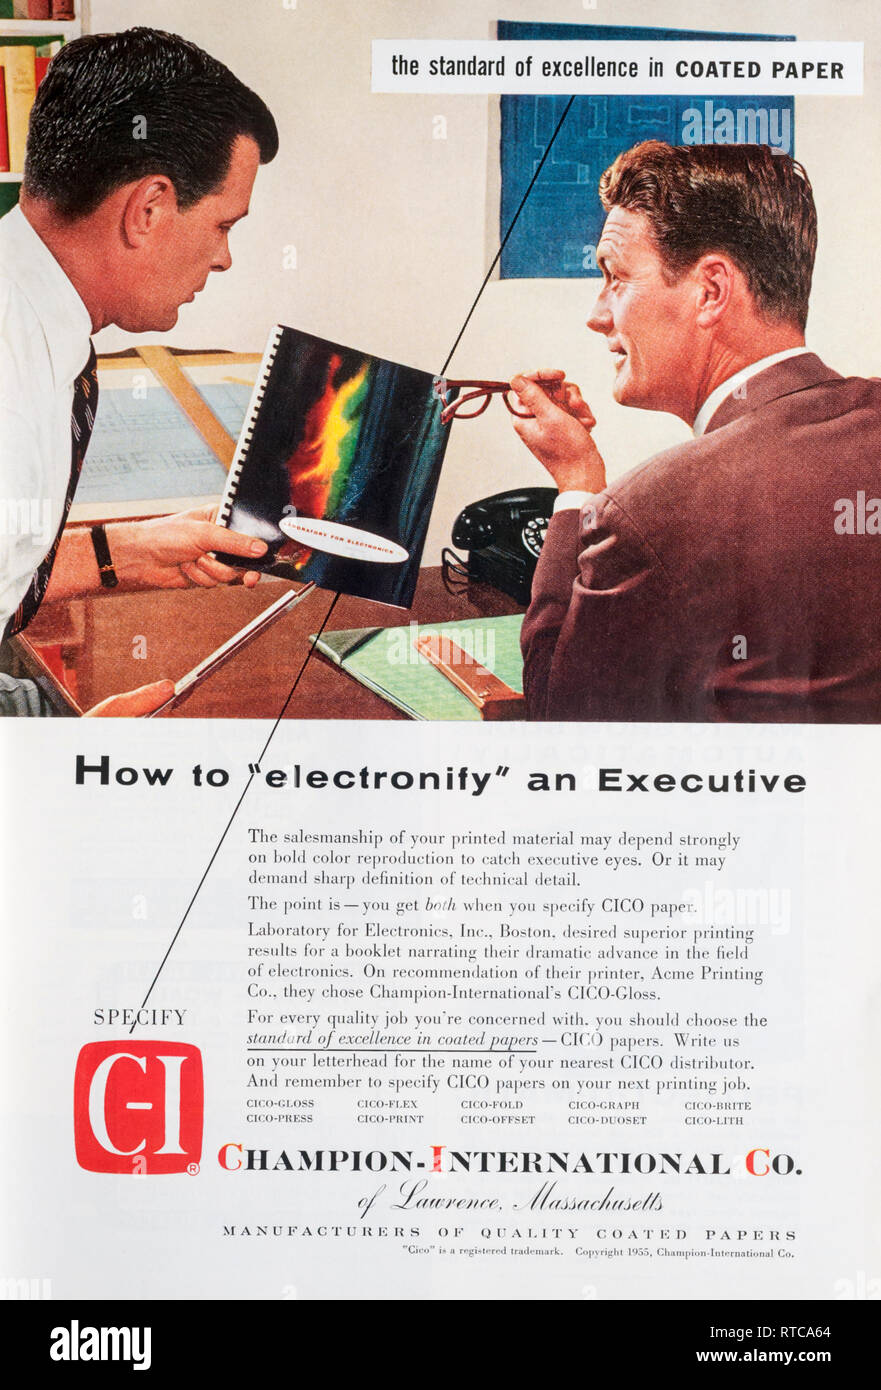 1955 magazine advert for Champion-International Co paper Stock Photo